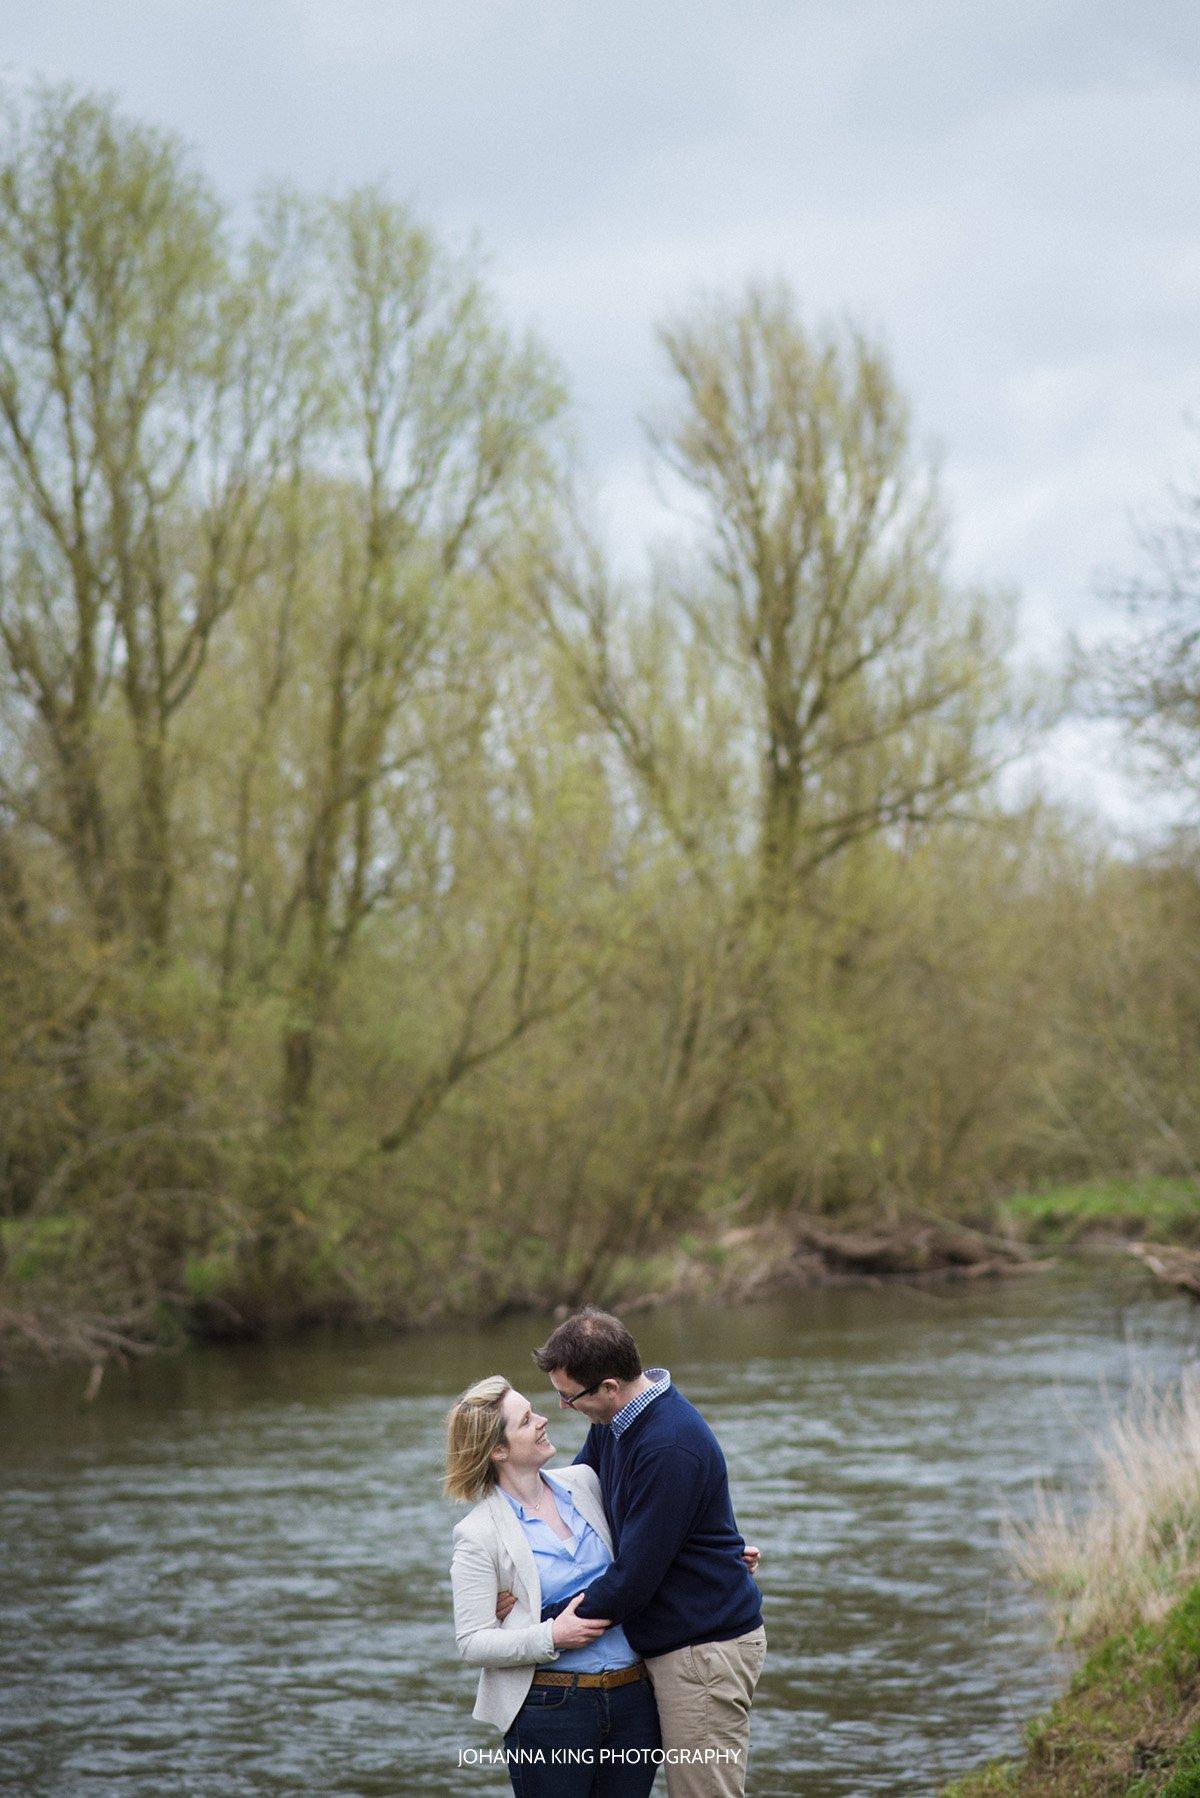 Couple photo session near Kilkenny